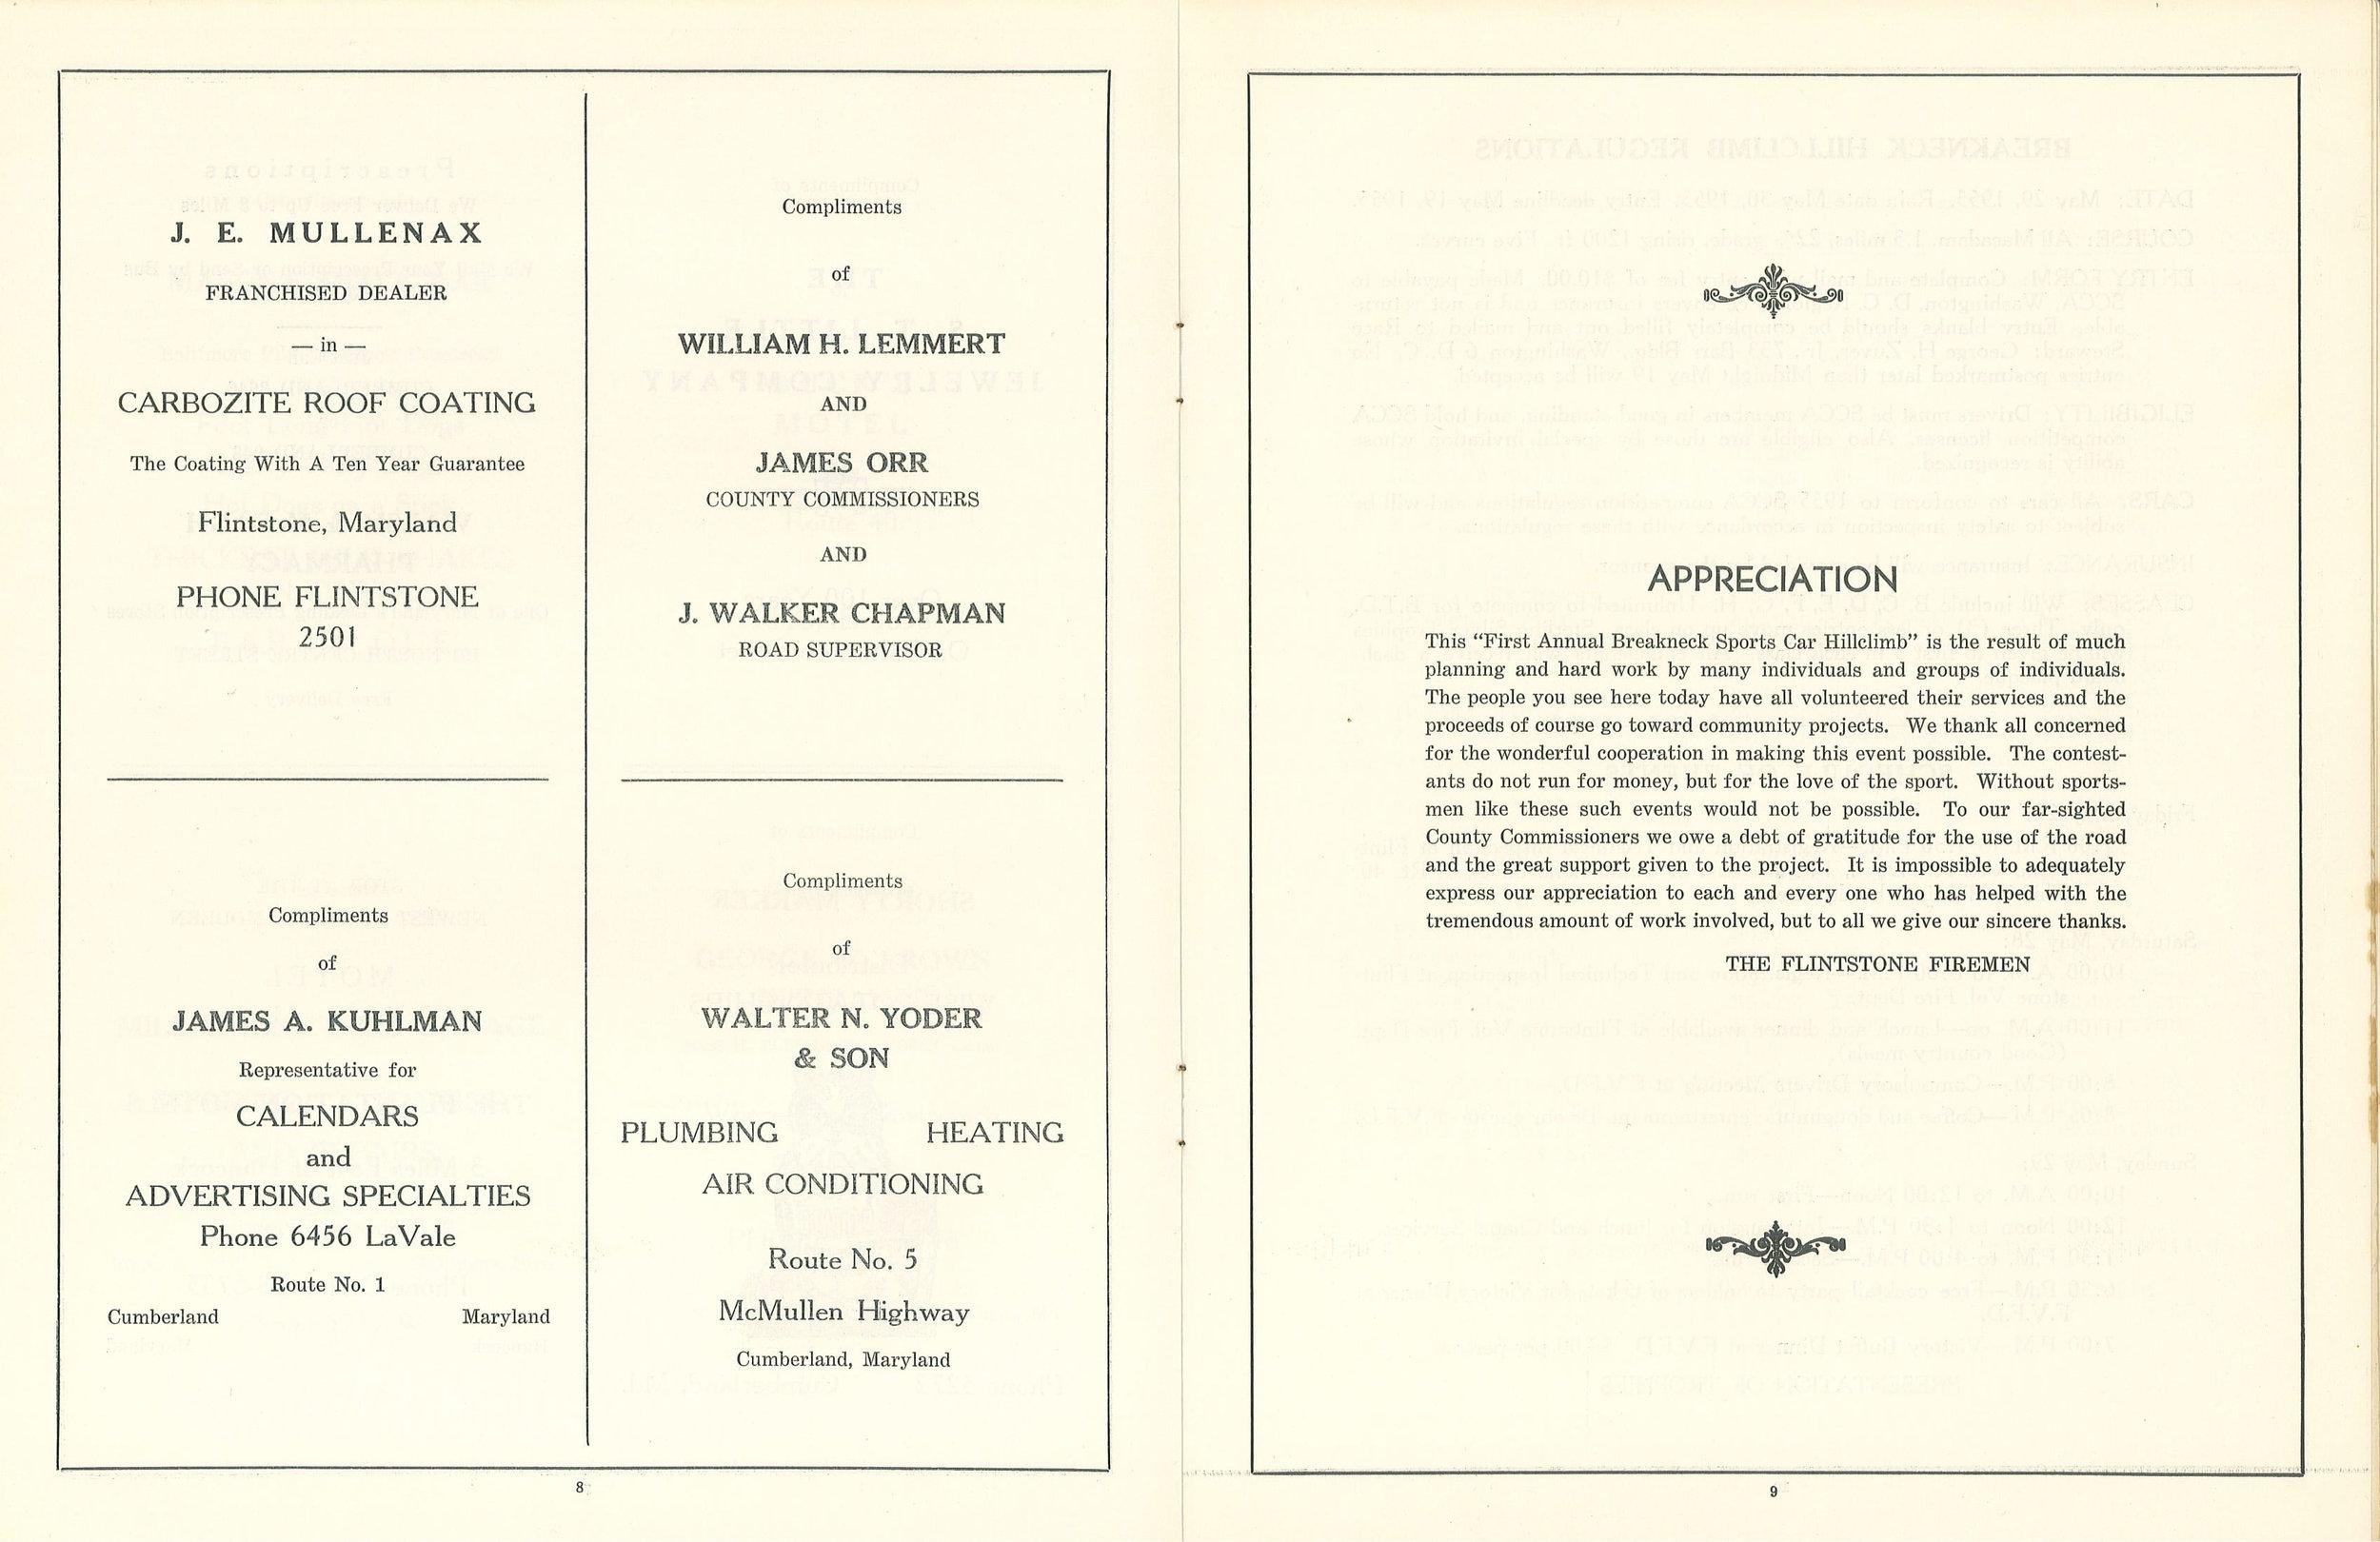 1955_Breakneck_Flinstone_VFD-1.jpg